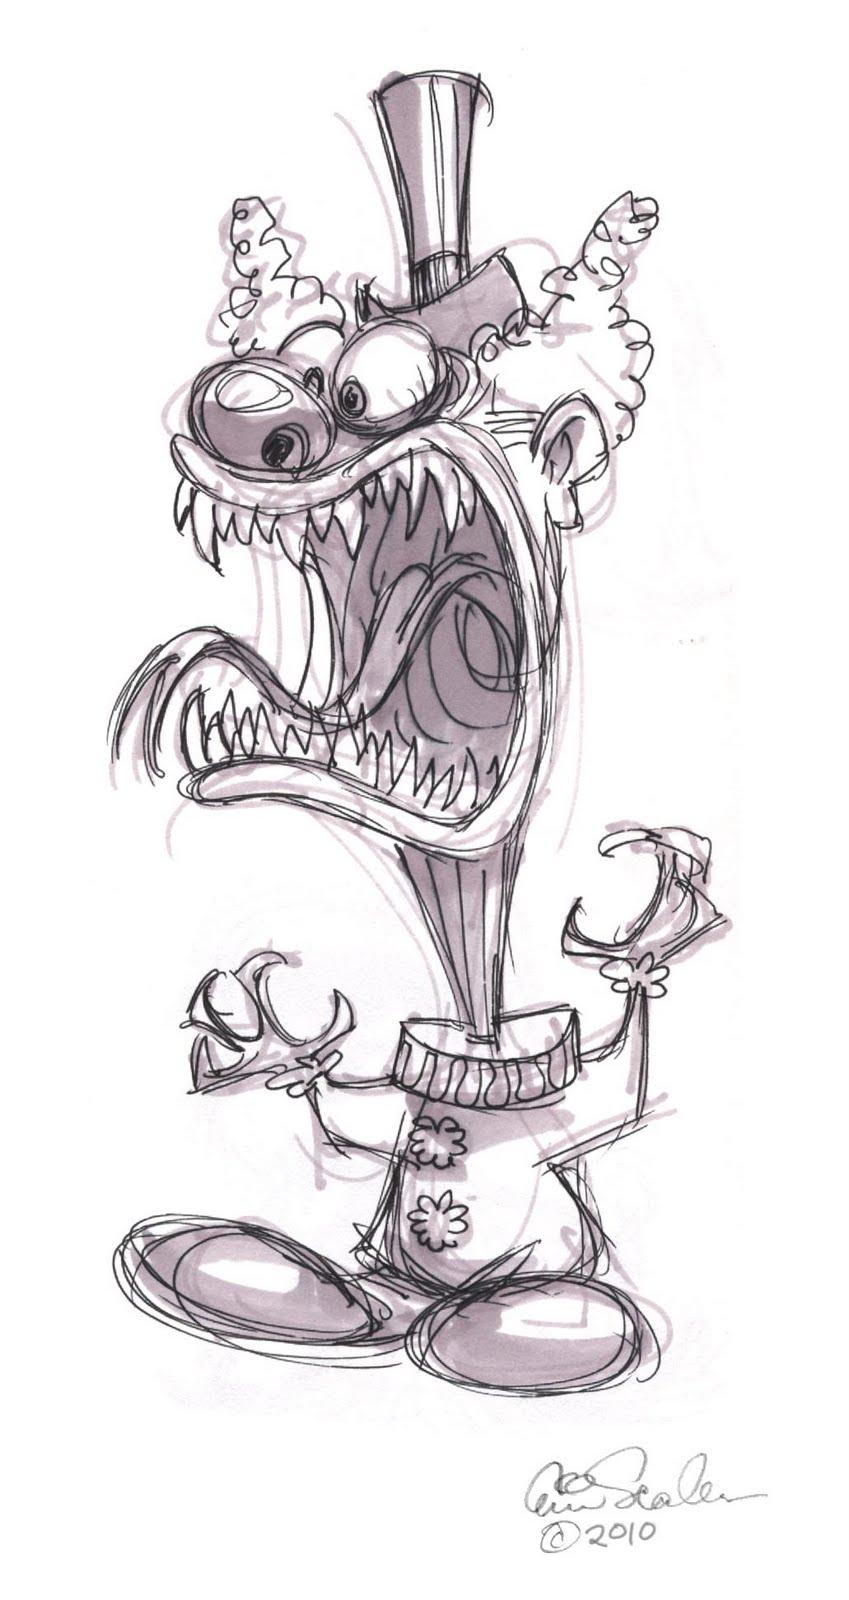 Scary Clown Drawing: The Ol' Sketchbook: June 2010